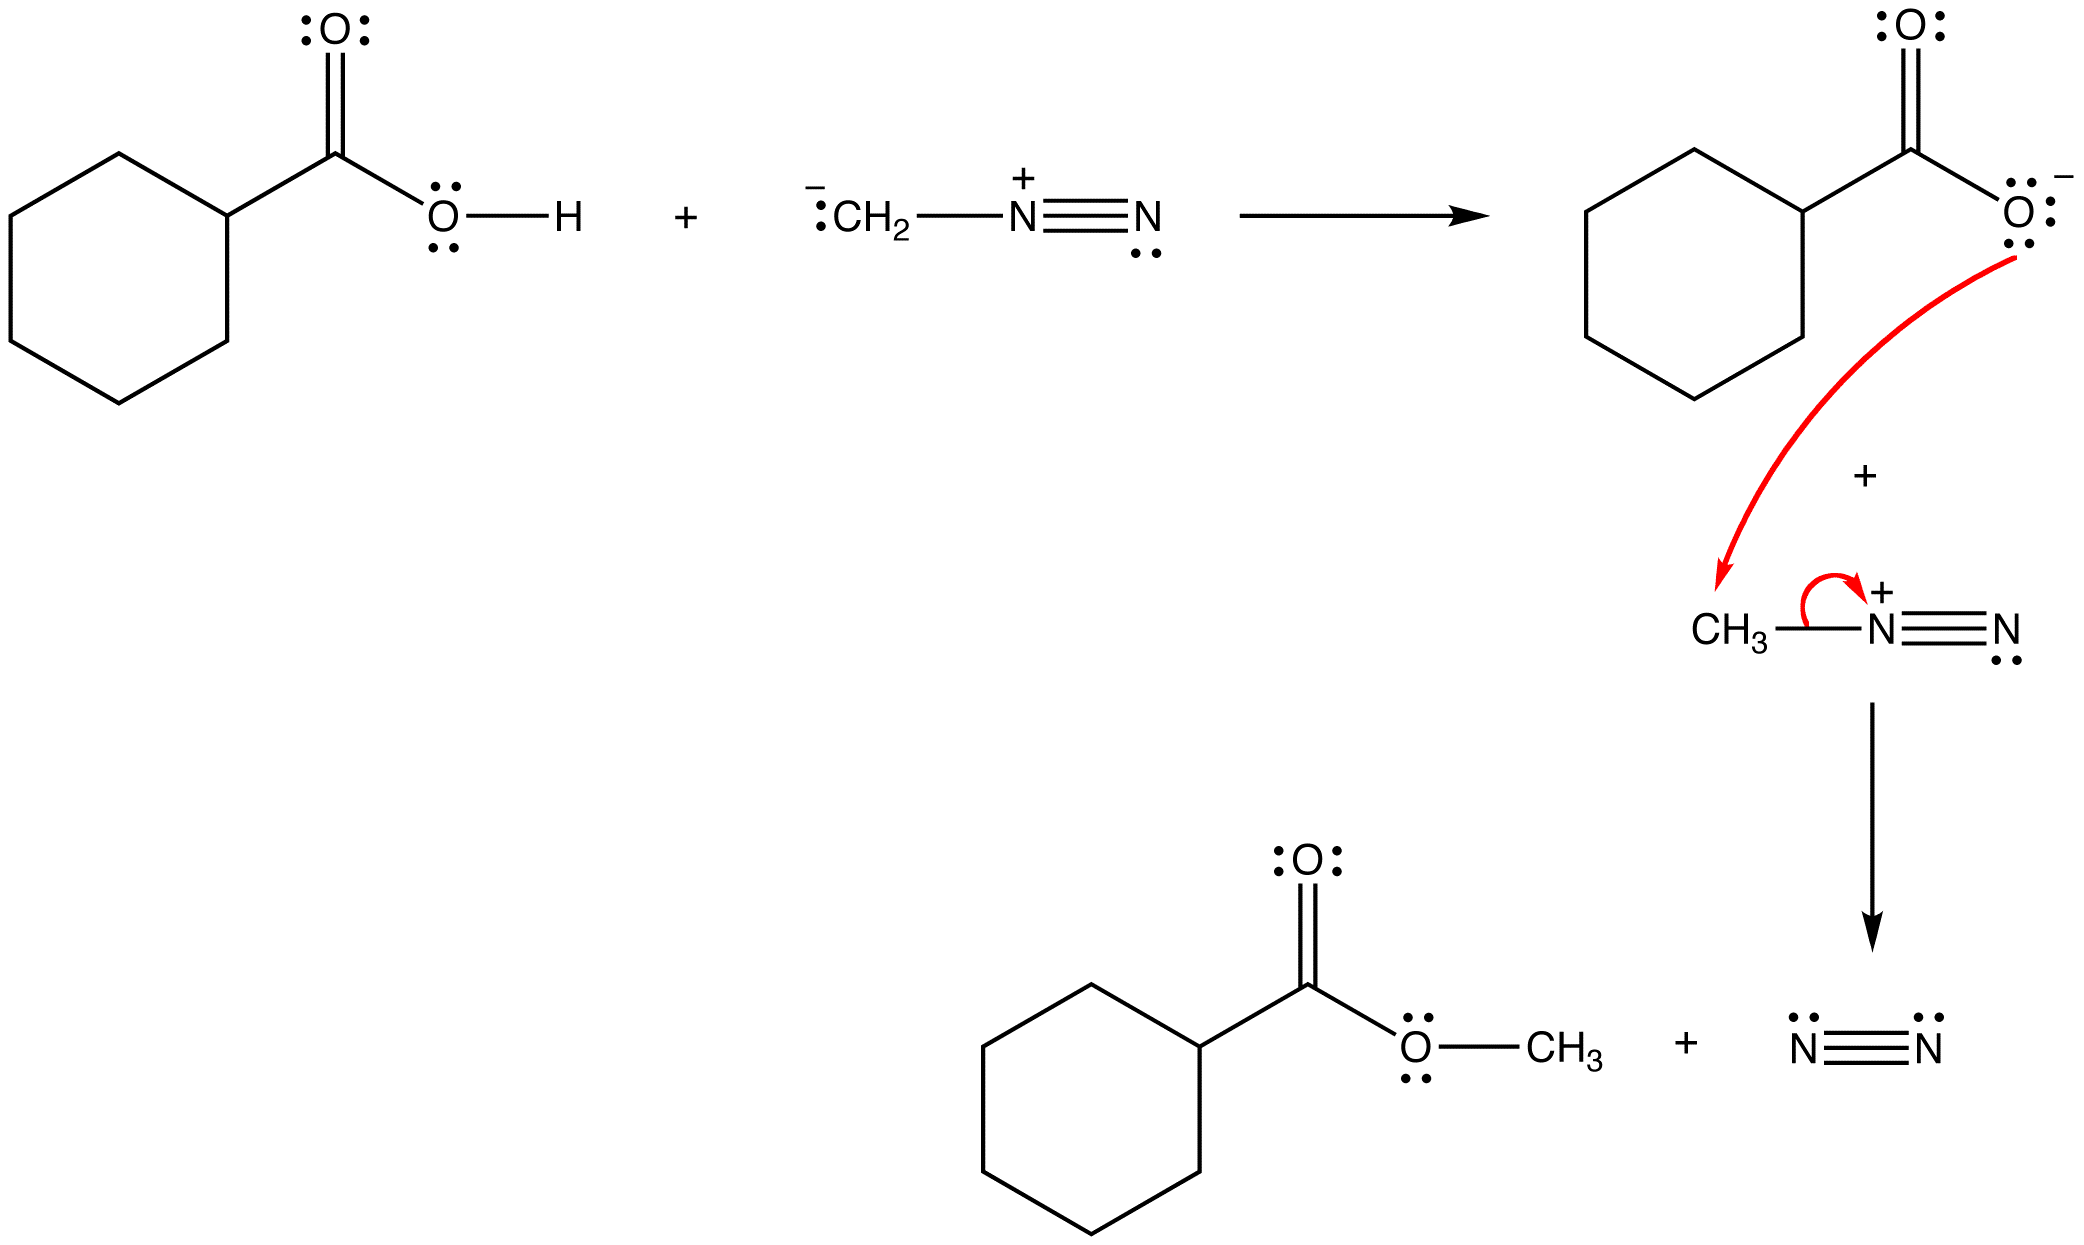 Diazomethane Ochempal